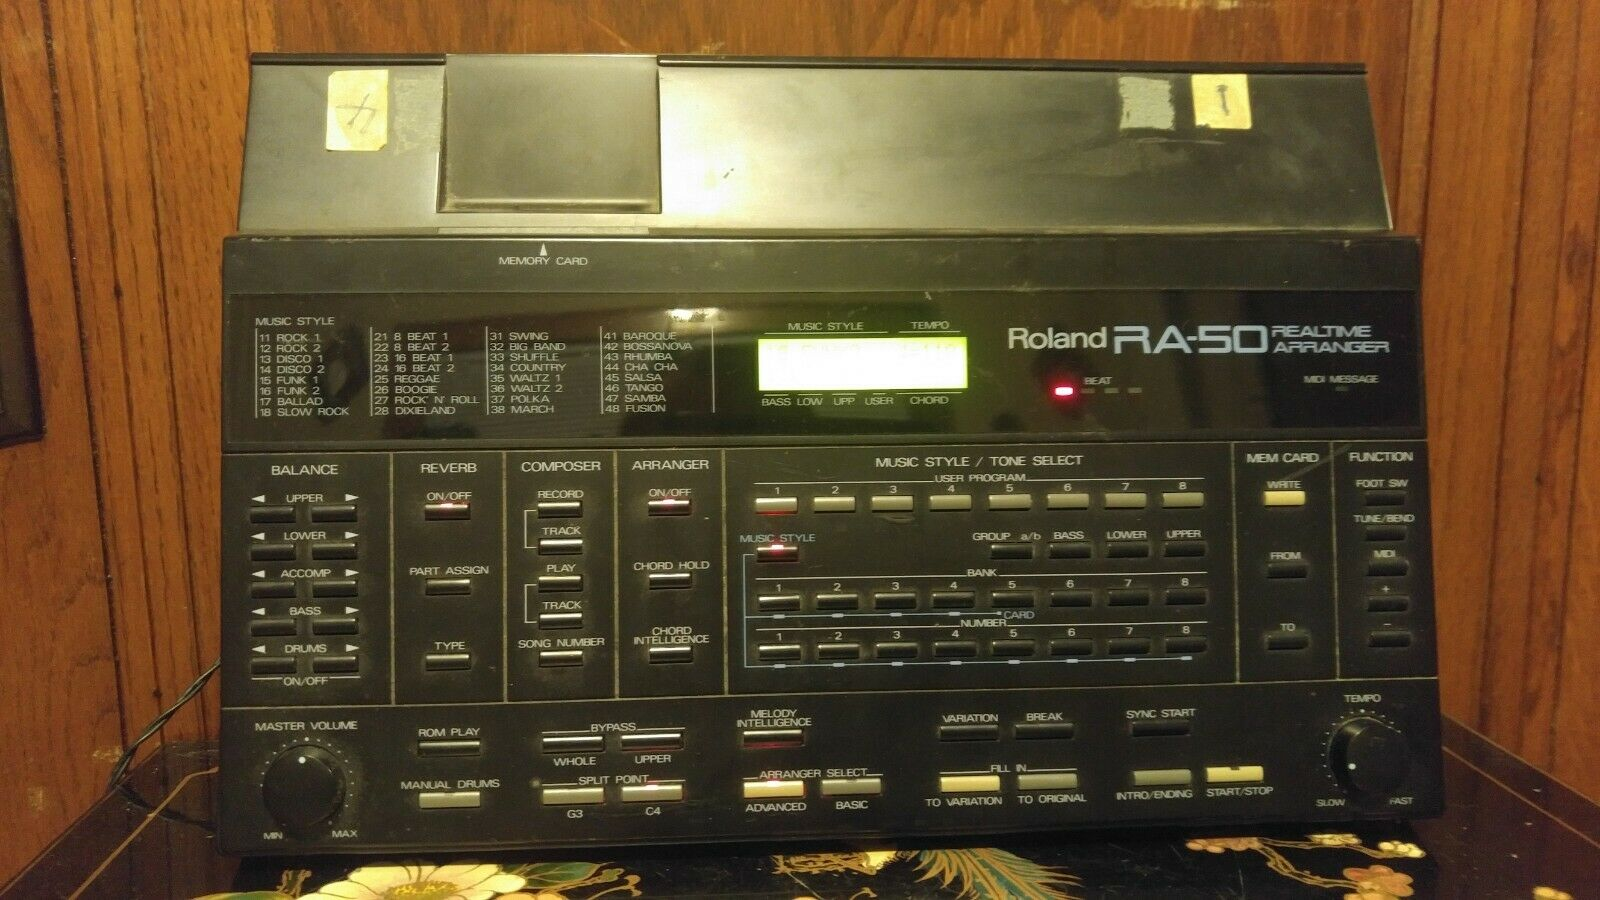 Roland RA-50 REAL TIME ARRANGER MIDI Expander